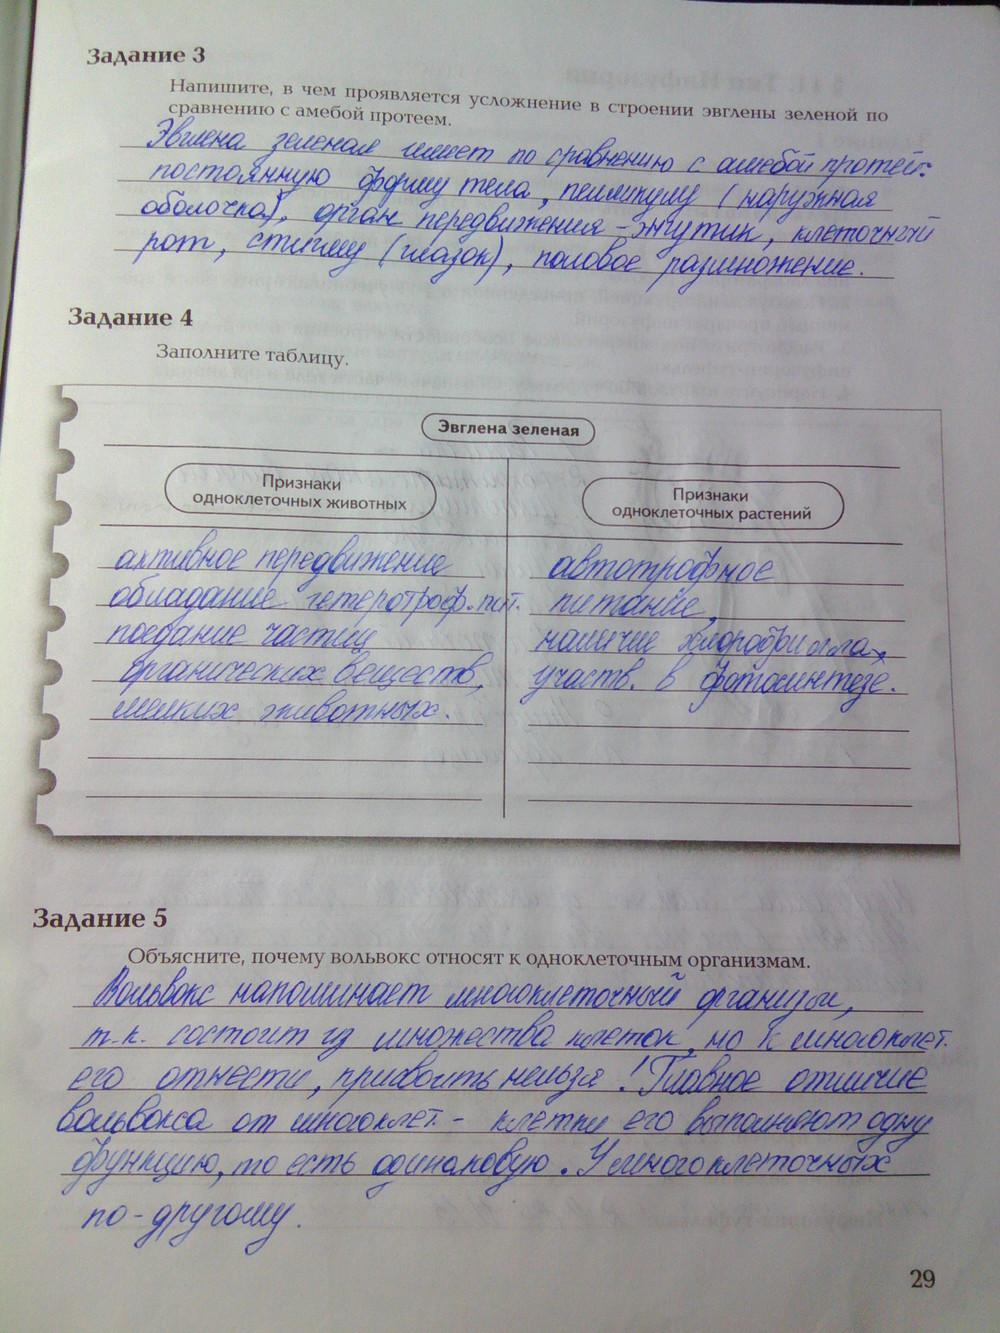 гдз по биологии суматохин кучменко фиолетовая тетрадь